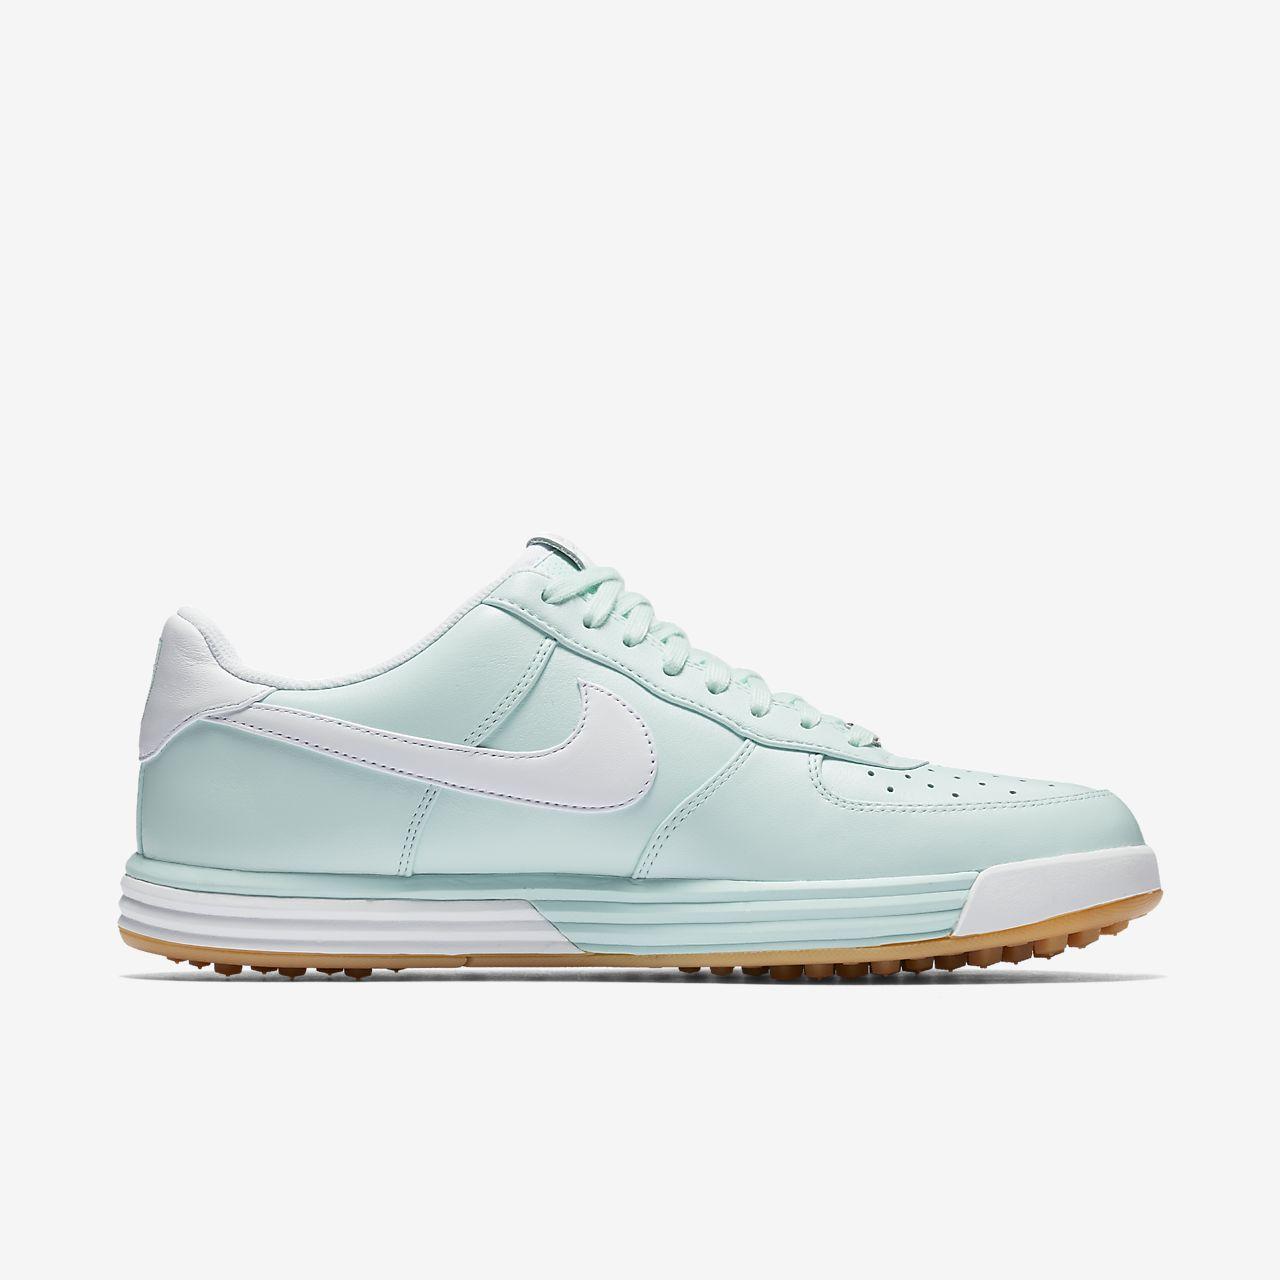 ... Nike Lunar Force 1 G Men\u0027s Golf Shoe